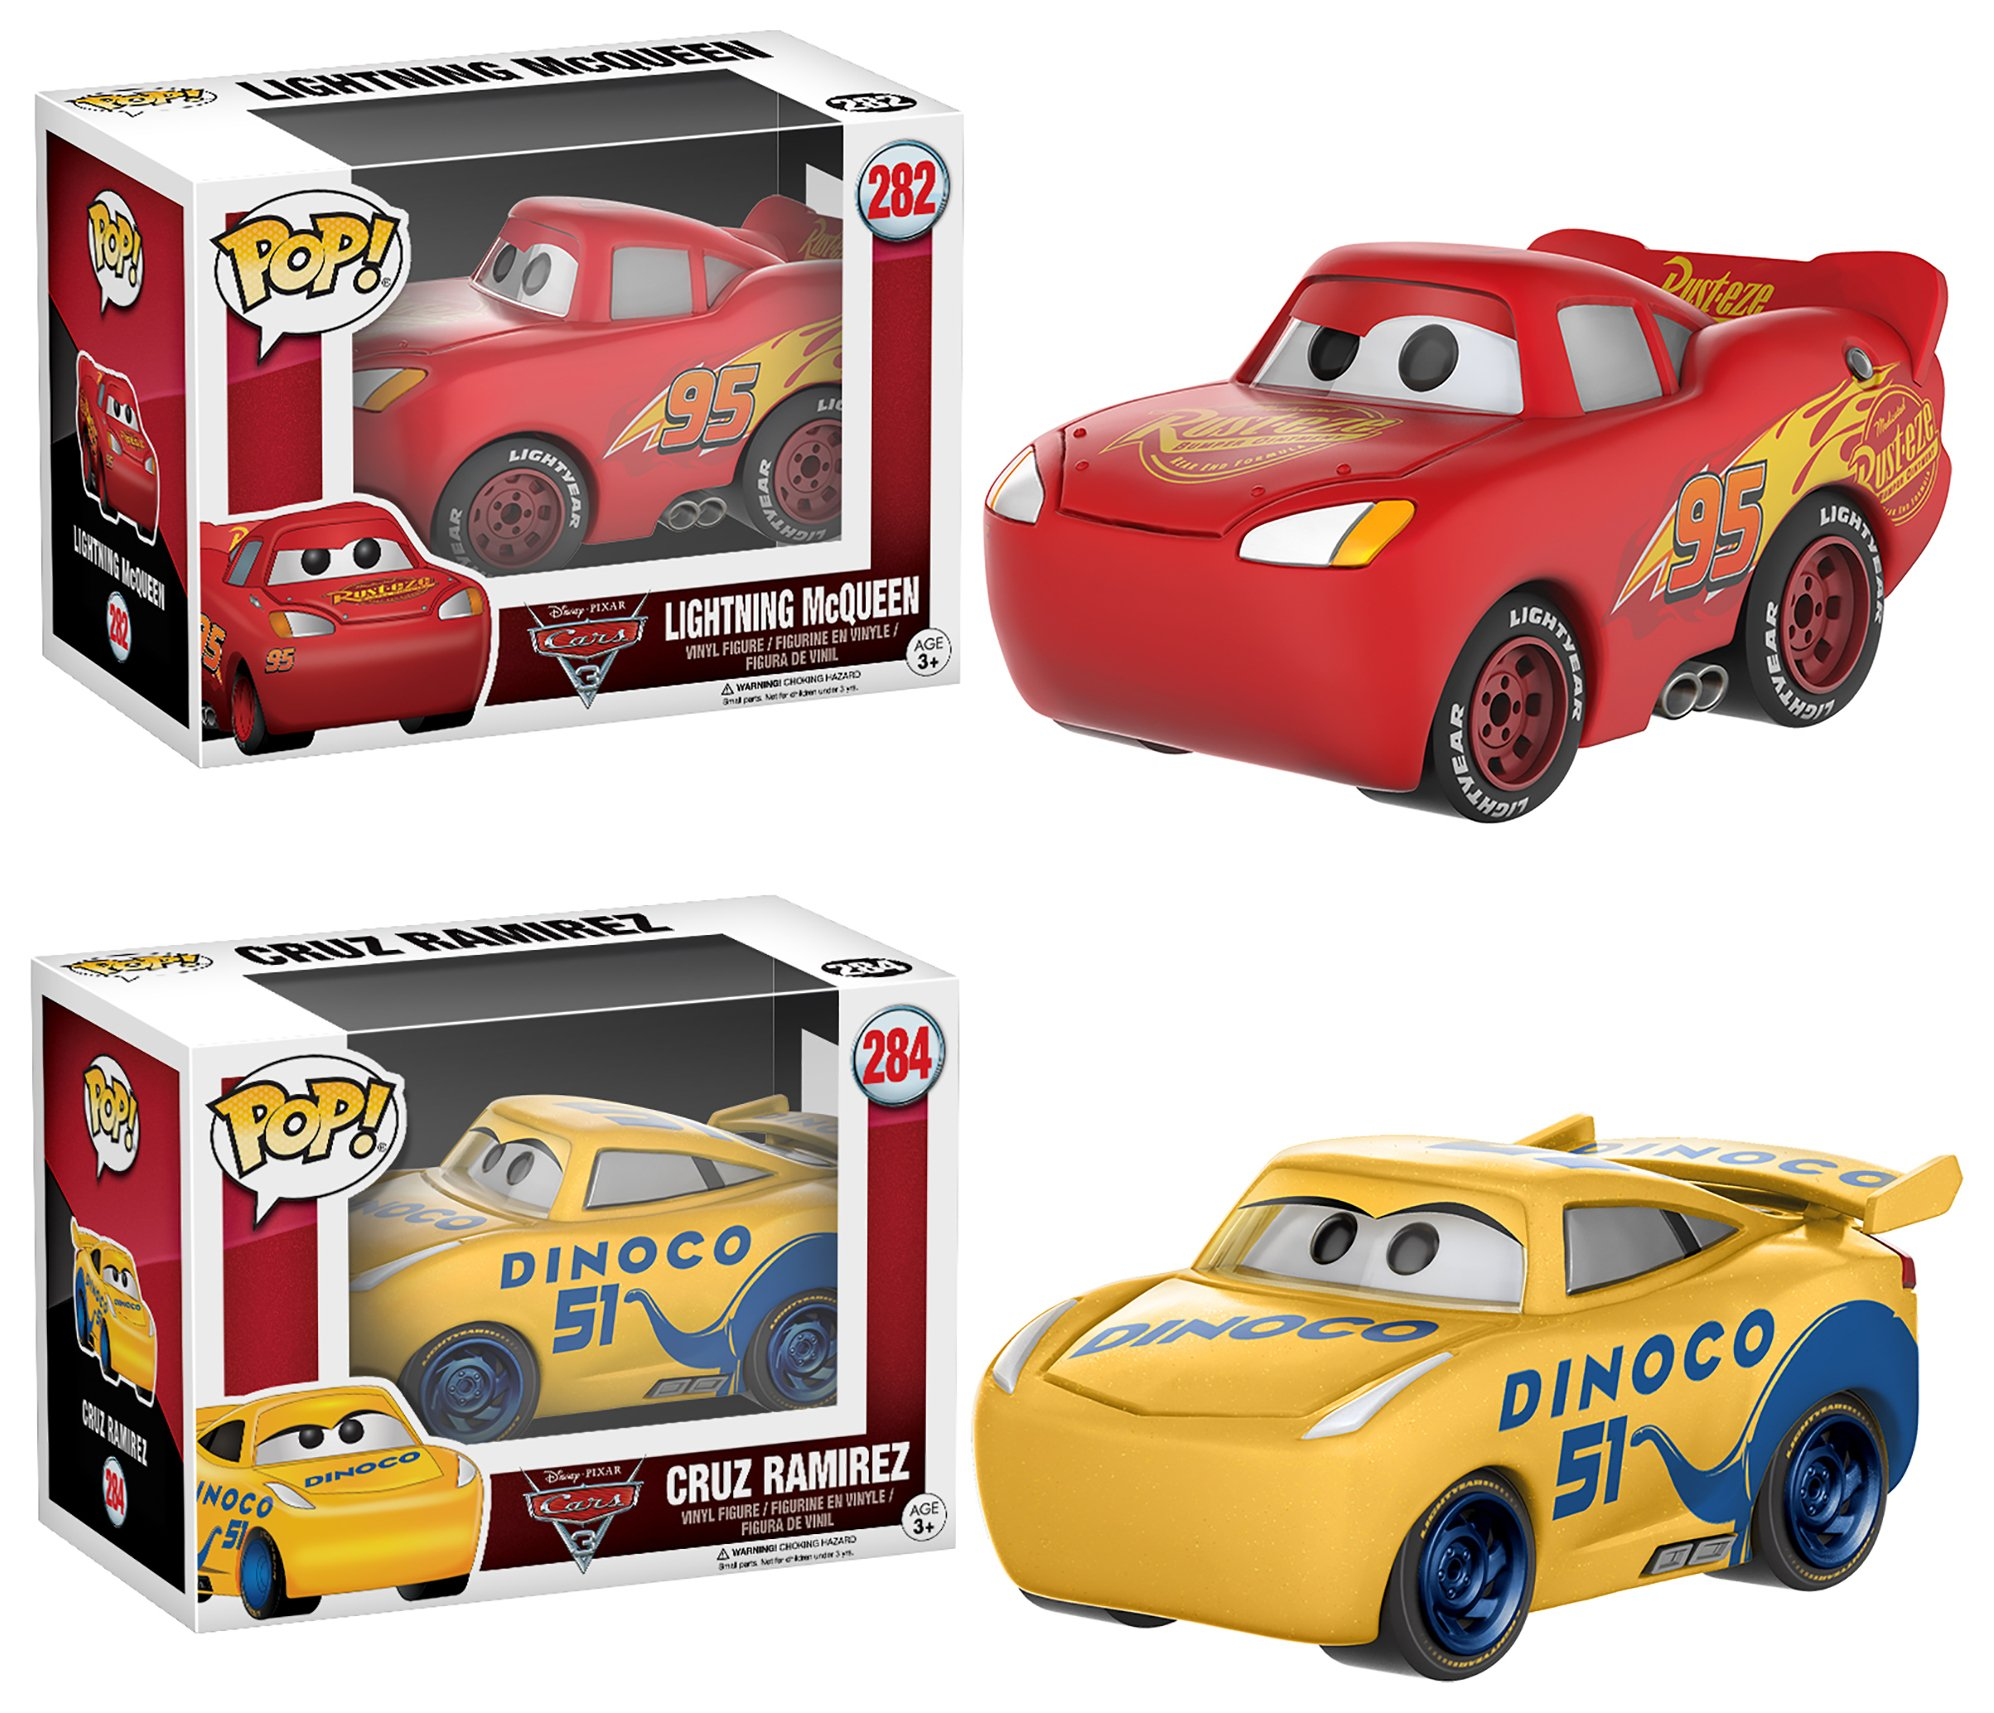 Image of Cars 3 Pop! Vinyl McQueen and Cruz Bobble Head Gift Set